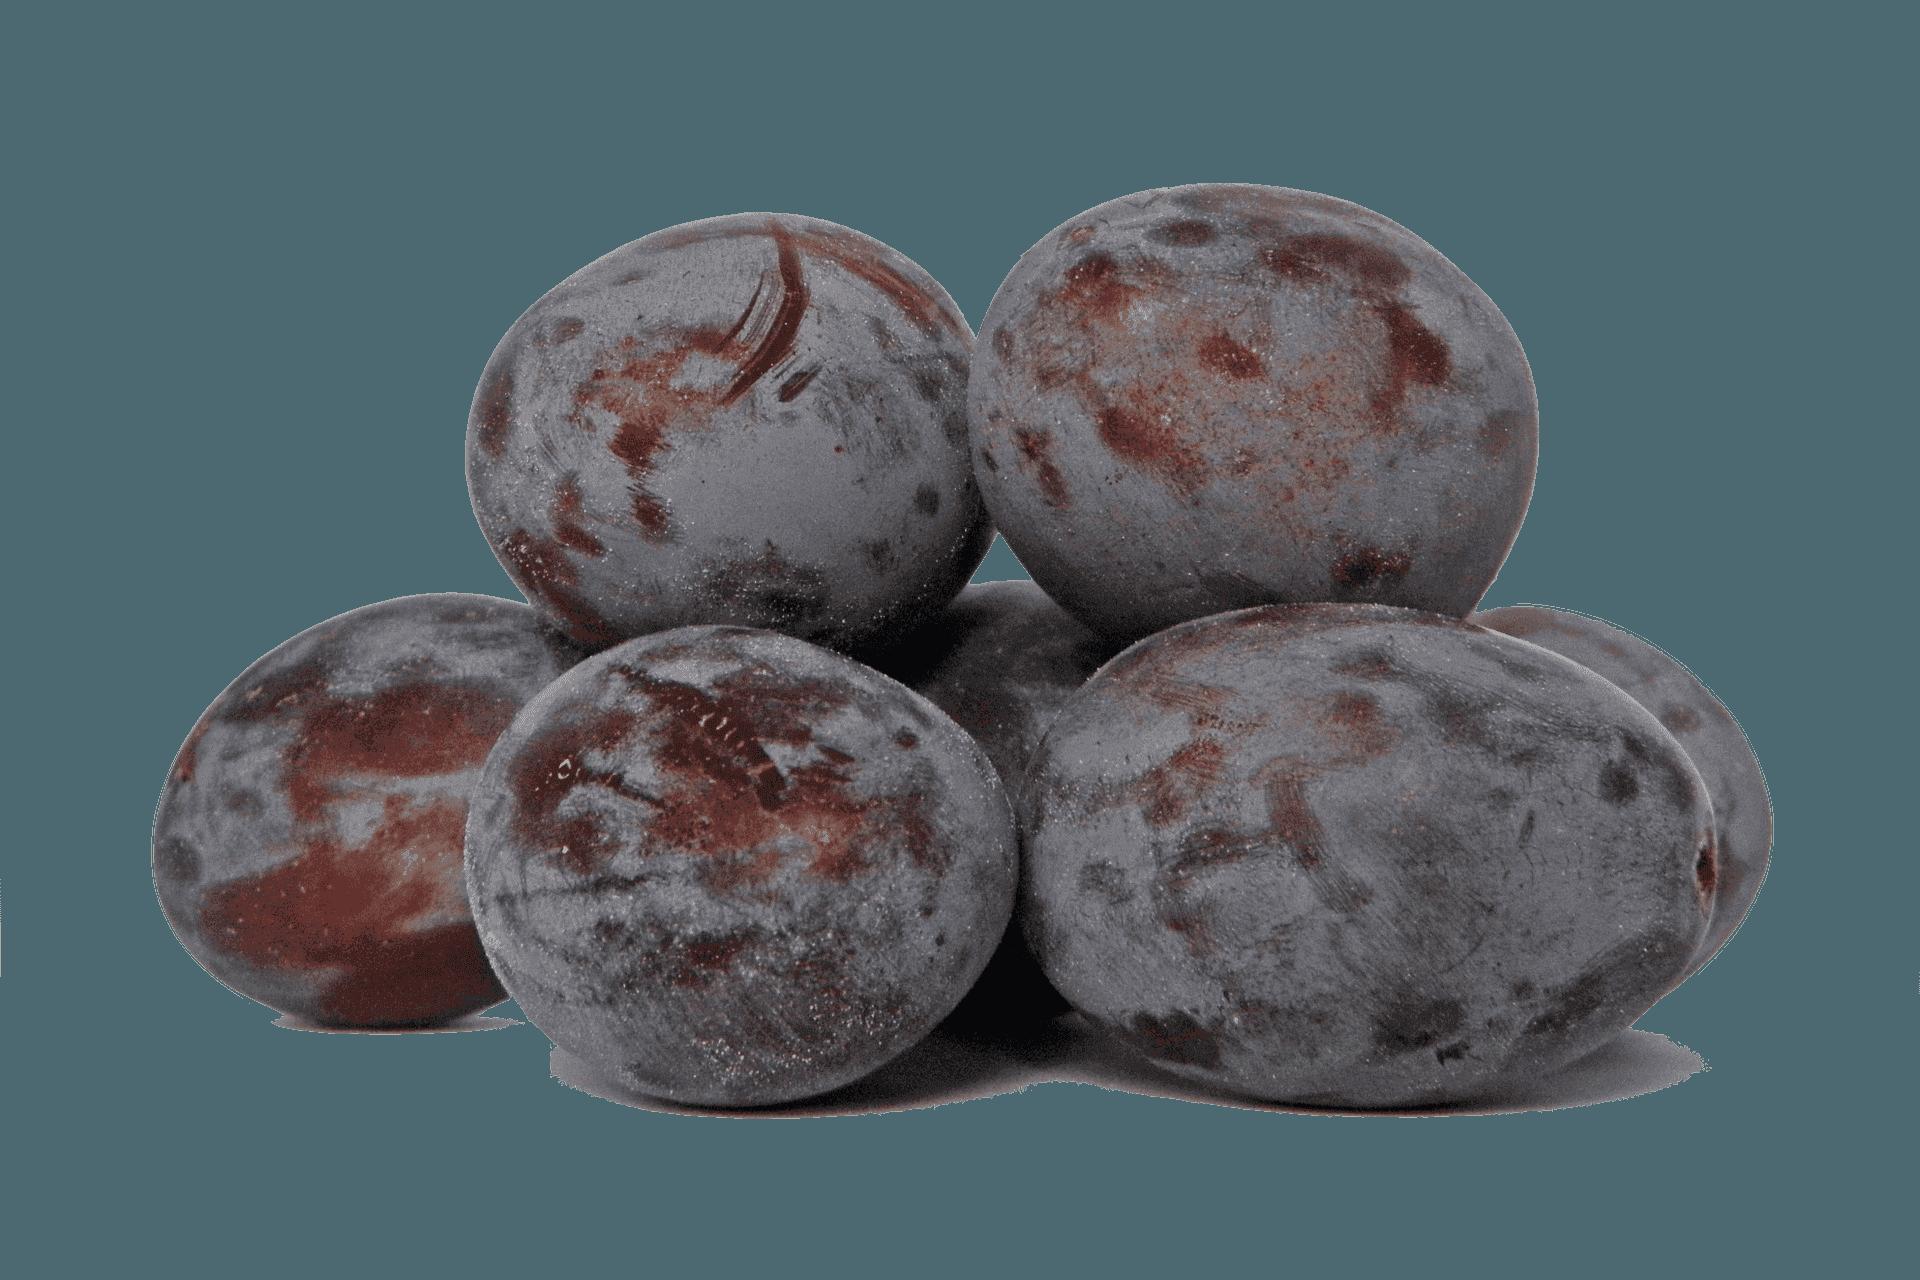 Alte Pflaumen- | Zwetschgensorten